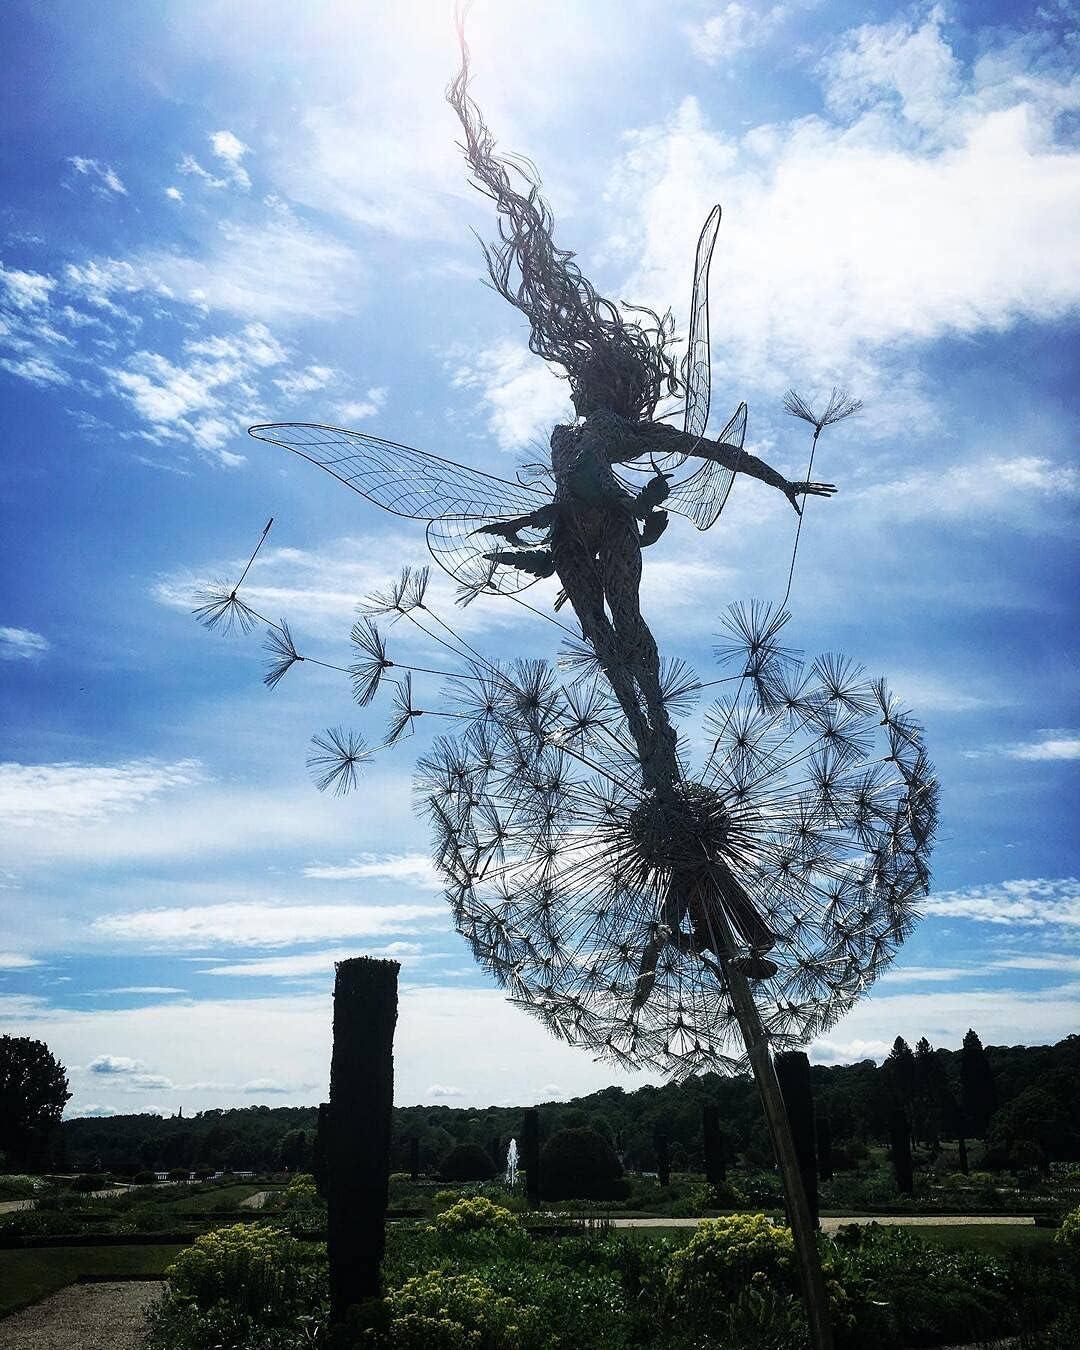 Faries and Dandelions Dance Together Sculpture, in Dark Metal Yard Art, Indoor Outdoor Lawn Pathway Patio Ornaments, Wind Catcher Yard Patio Decoration Graduation Gifts for Her 2021